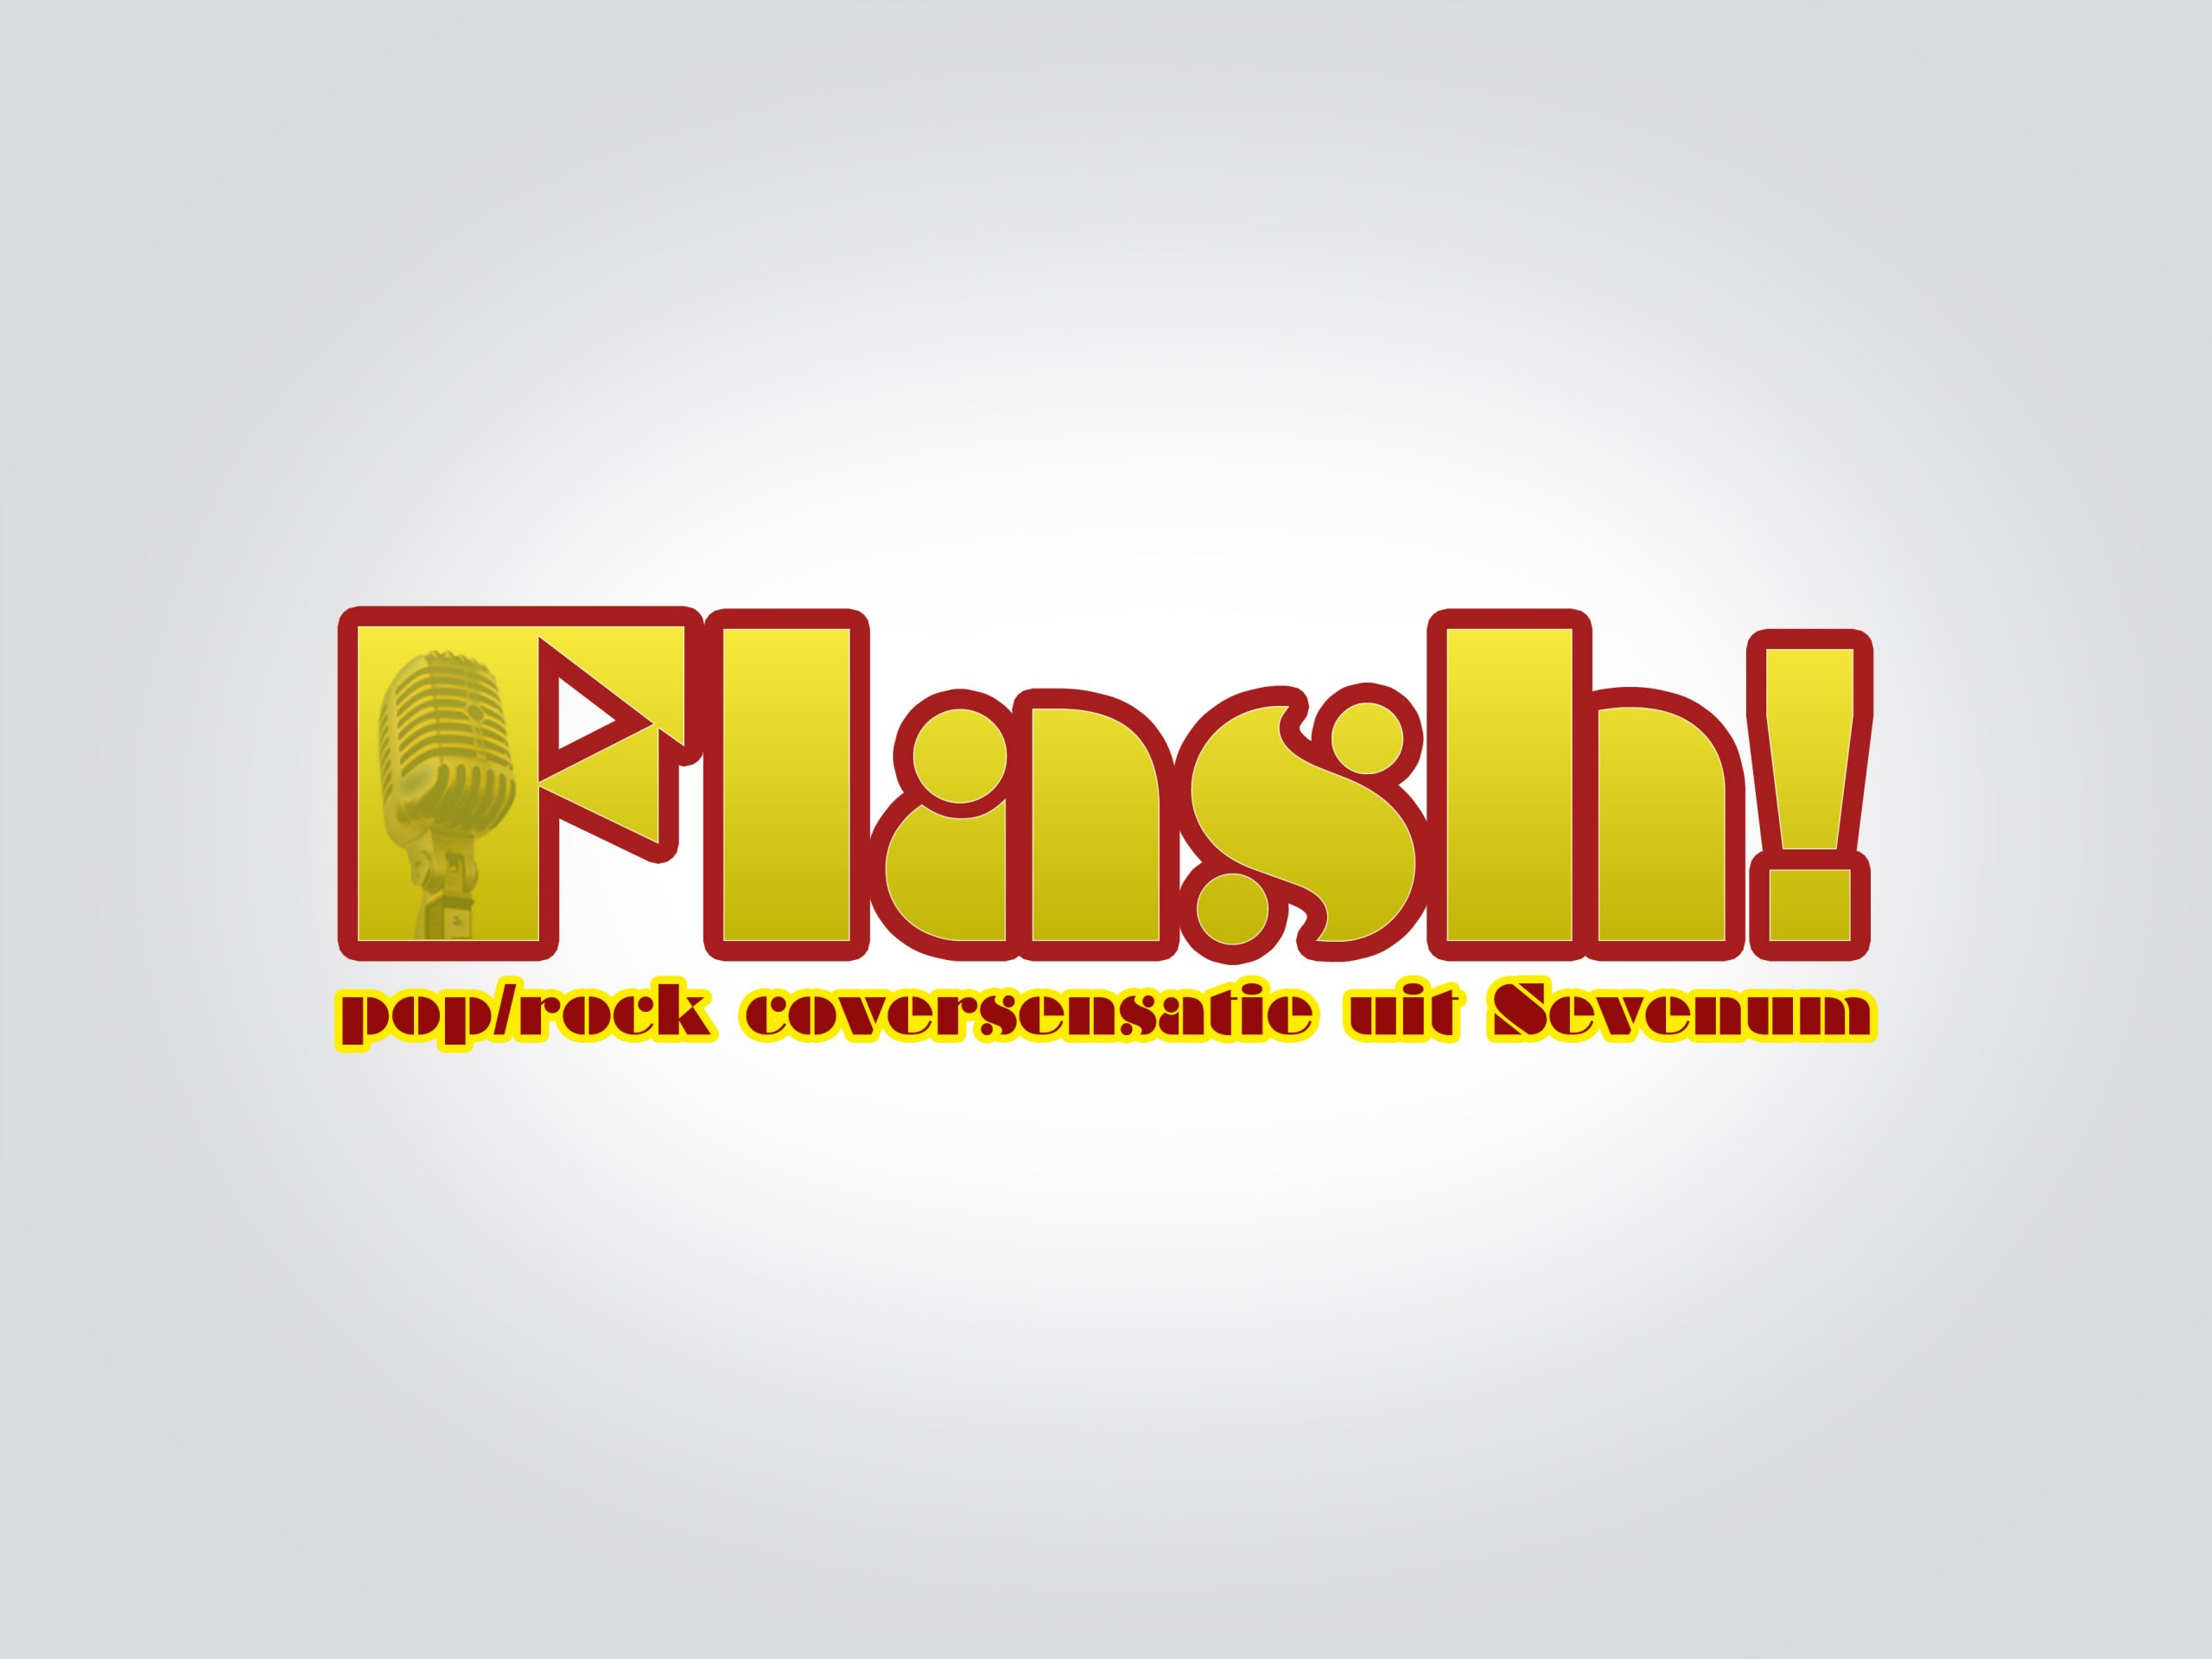 Flash! Logo ontwerp